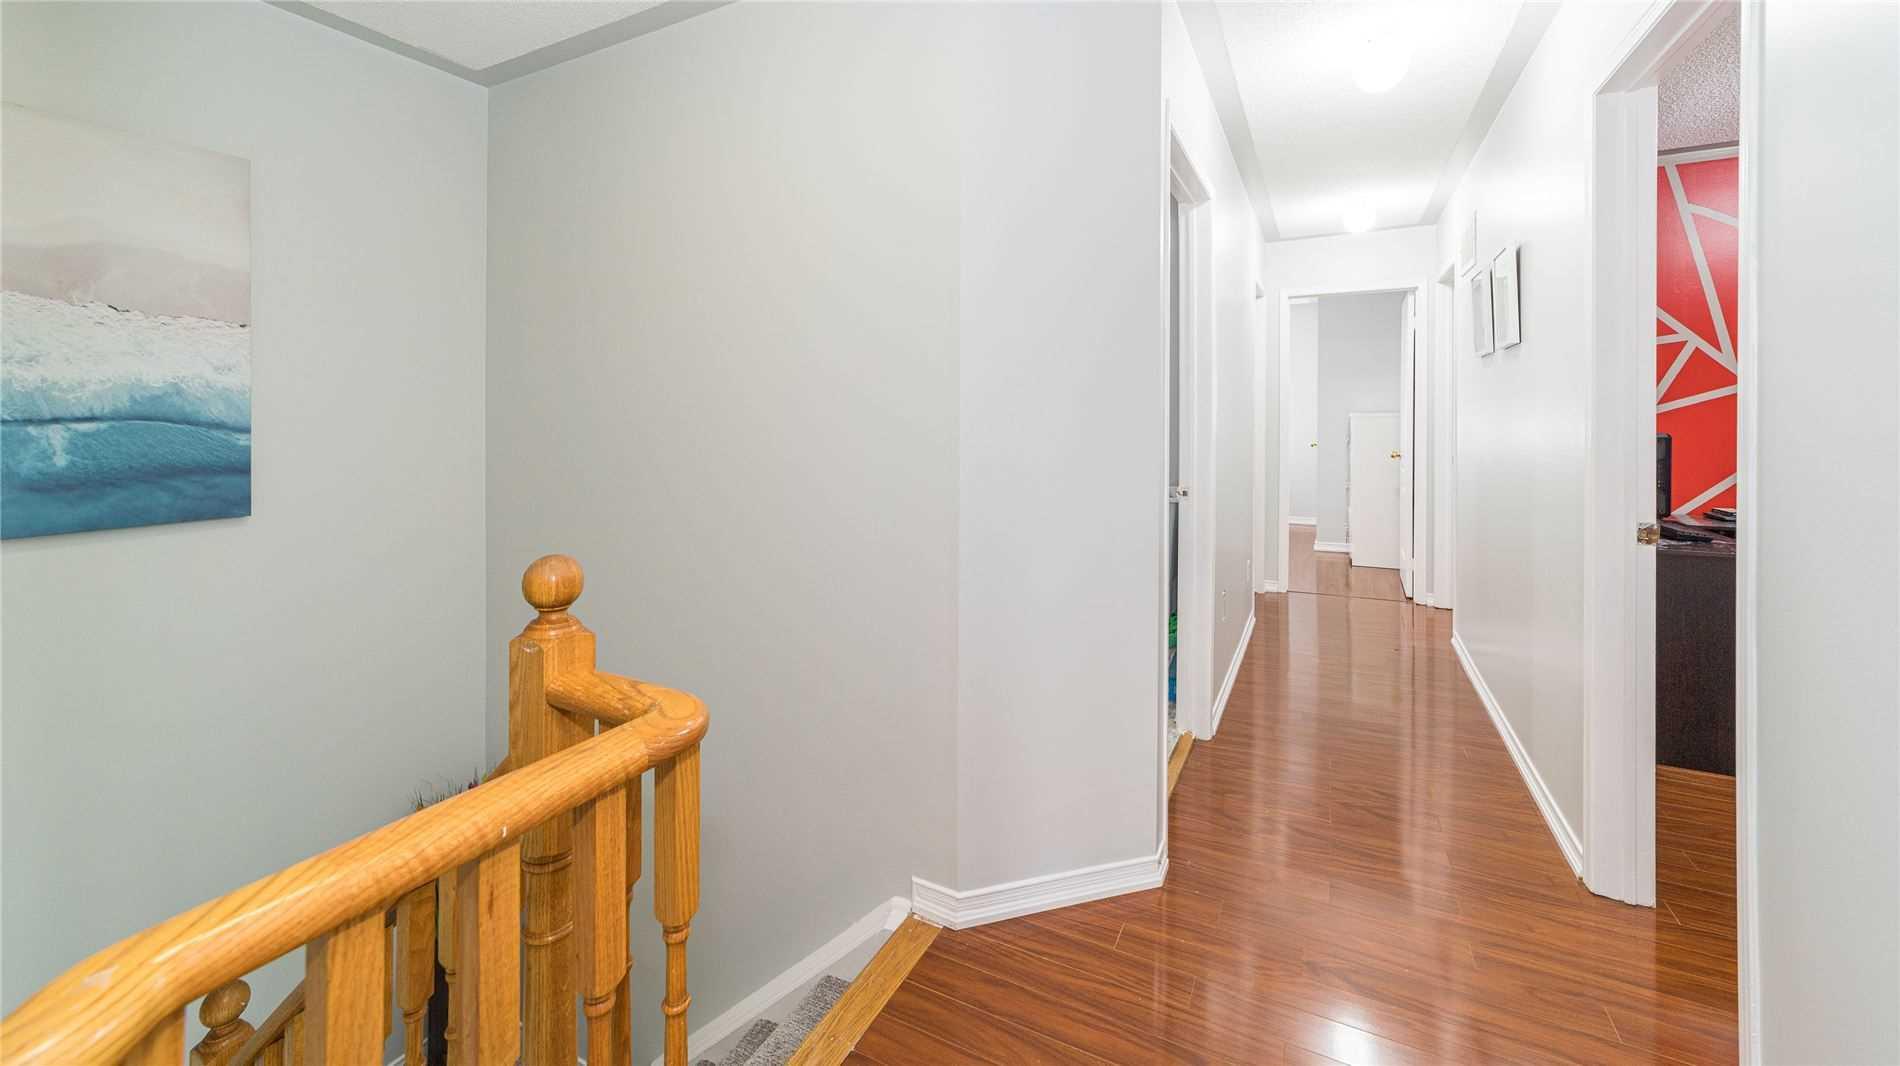 76 Larkspur Rd, Brampton, Ontario L6R 1X, 4 Bedrooms Bedrooms, 9 Rooms Rooms,4 BathroomsBathrooms,Detached,For Sale,Larkspur,W5354778